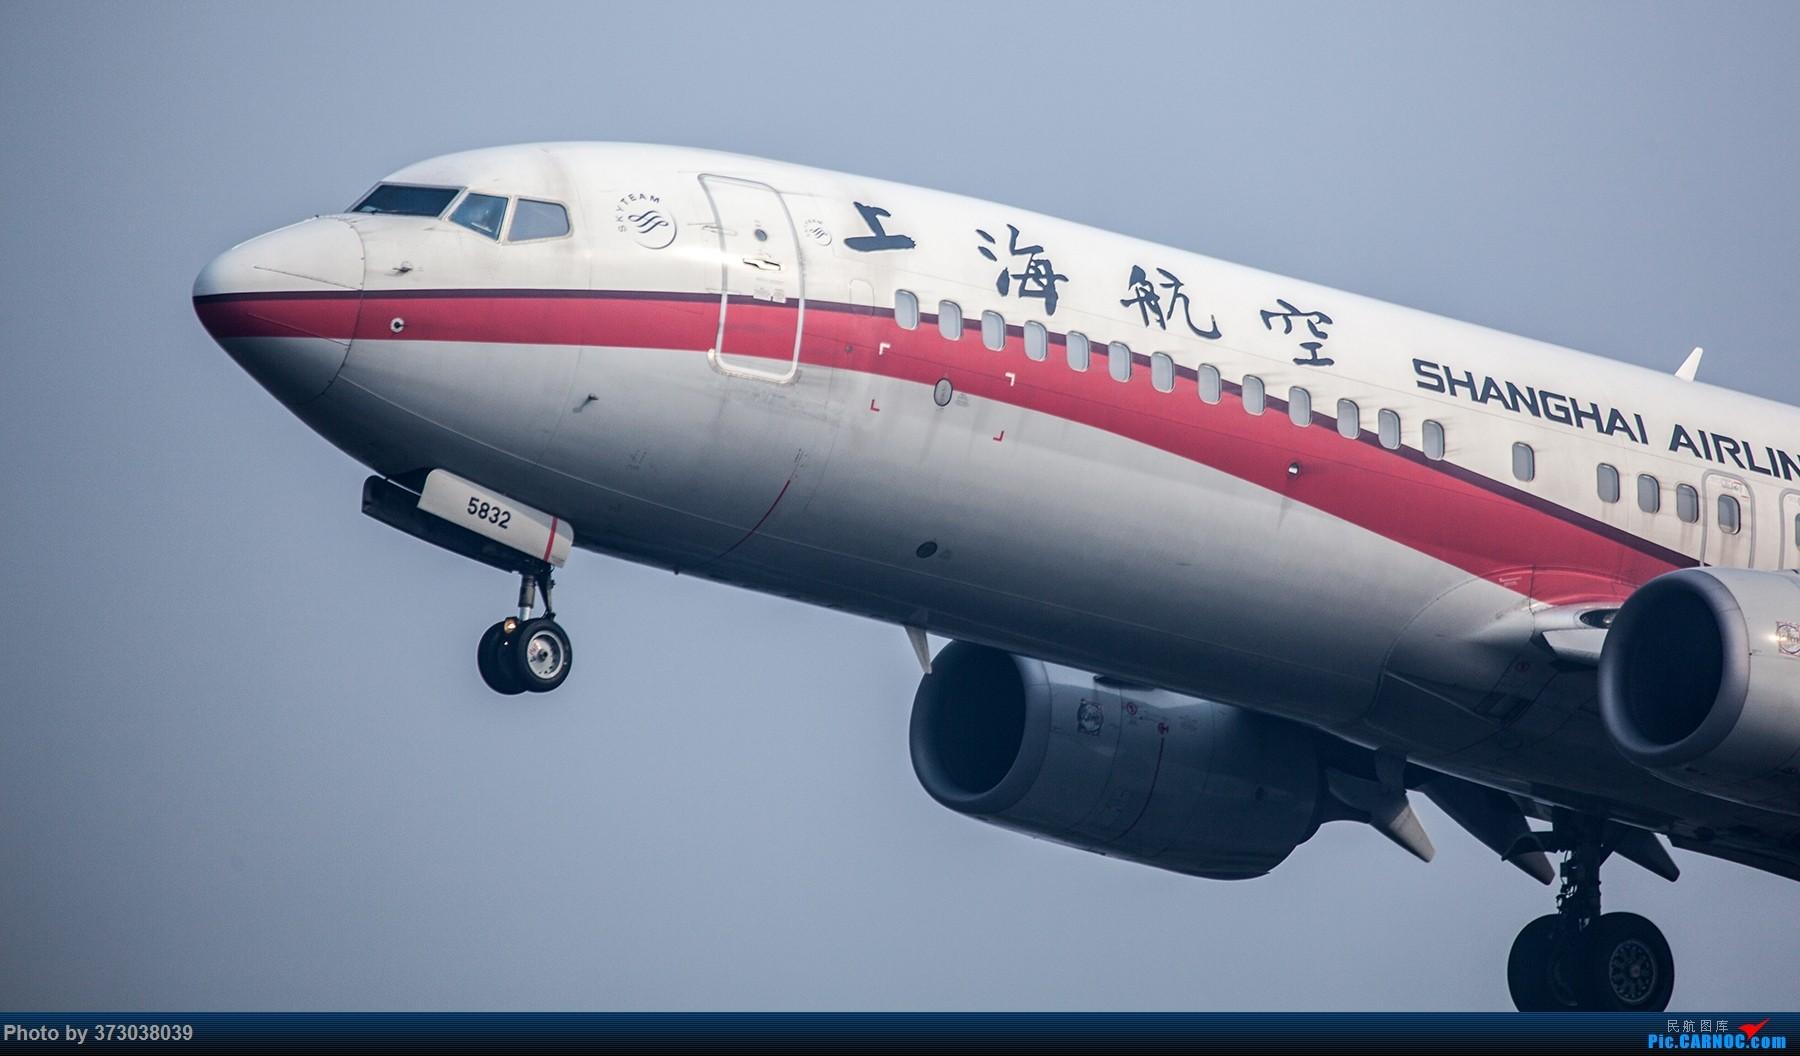 Re:[原创]【杭州飞友会】A320Neo迪士尼杭州萧山机场拍机班门弄斧记 BOEING 737-800 B-5832 中国杭州萧山国际机场